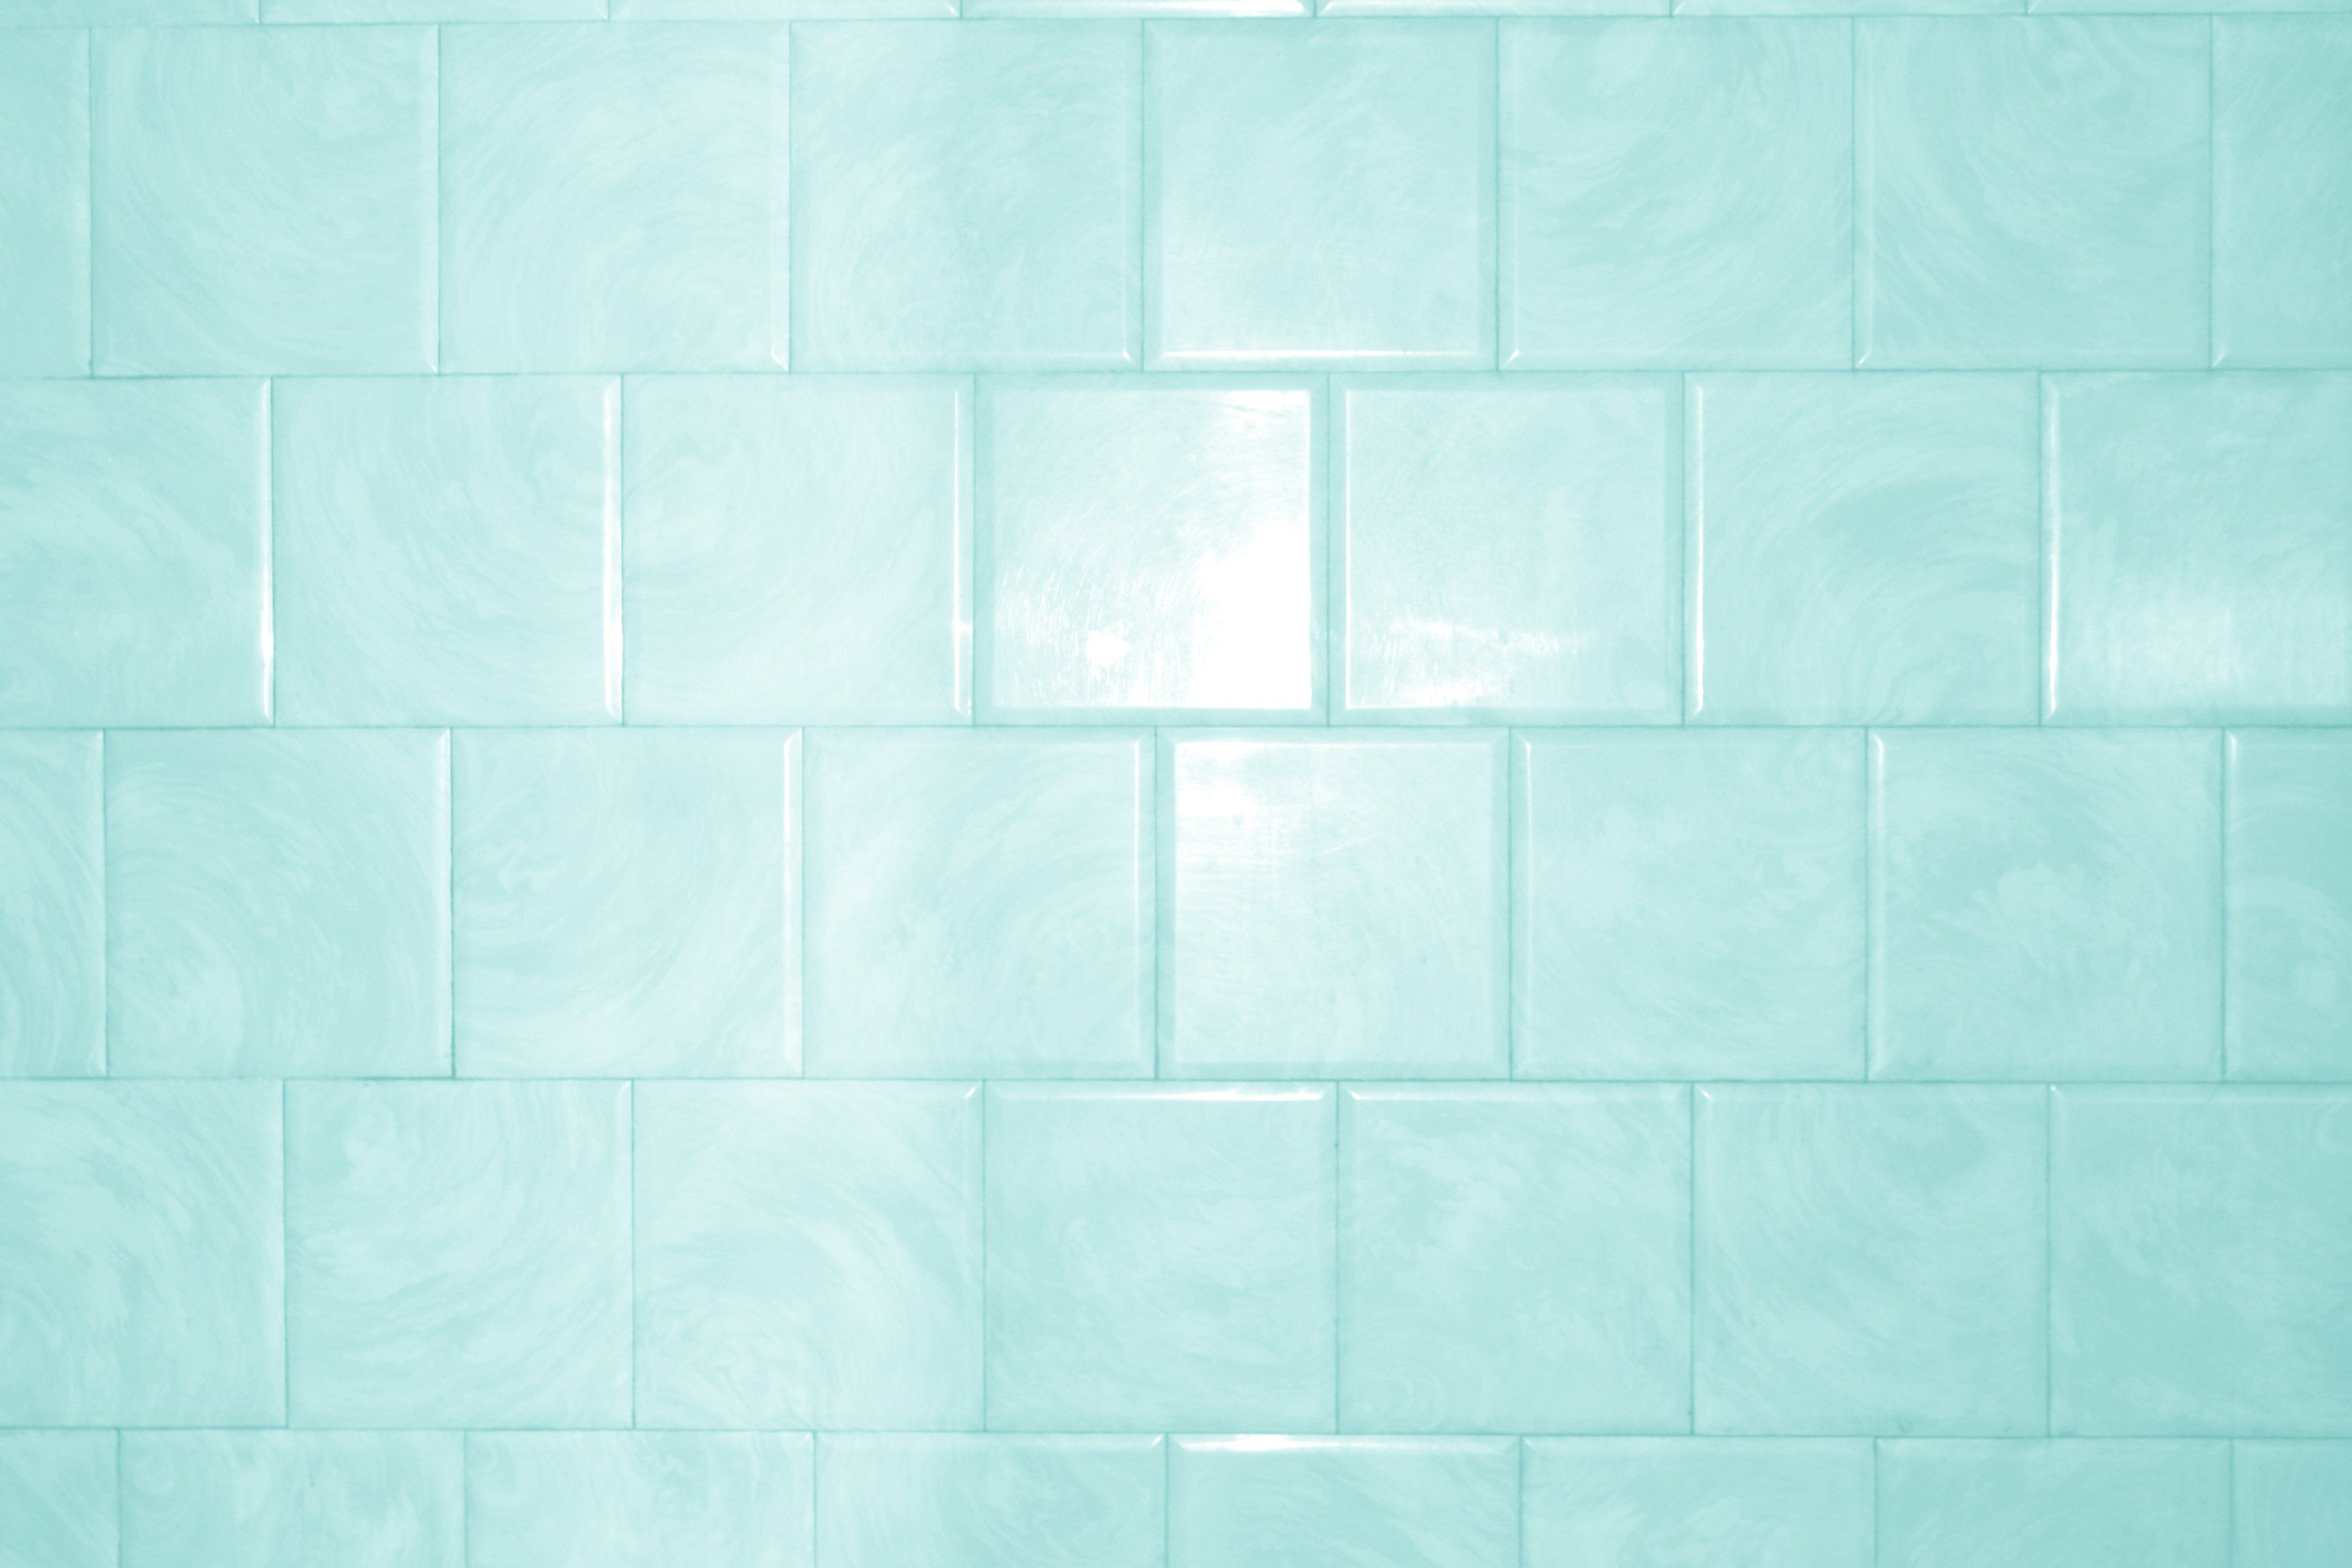 Aqua Or Teal Colored Bathroom Tile Texture With Swirl Pattern Room Tiles Tiles Texture Bathroom Tile Designs